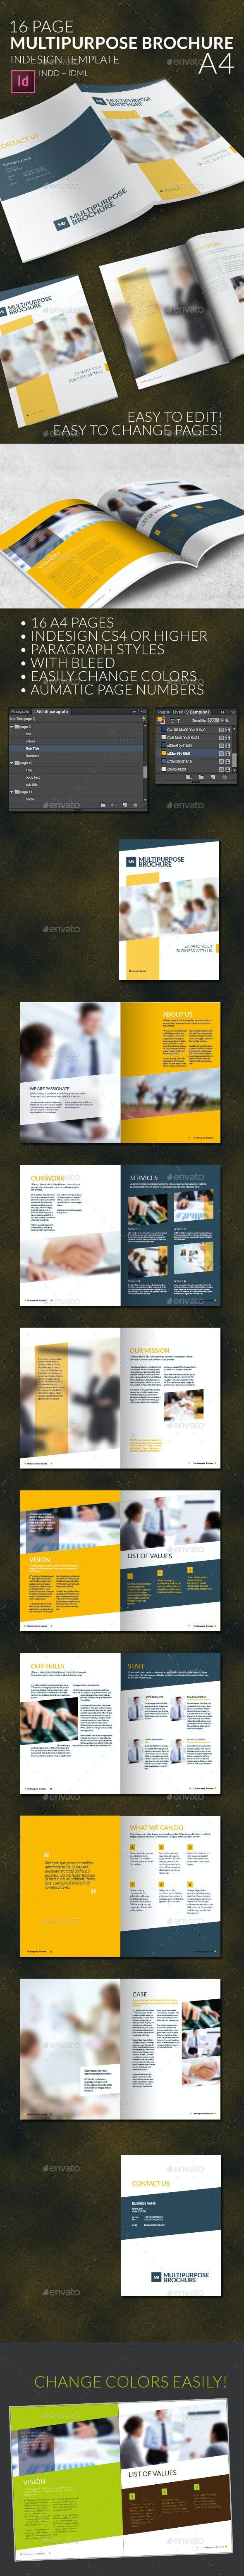 Multipurpose Business Brochure A4 - Informational Brochures